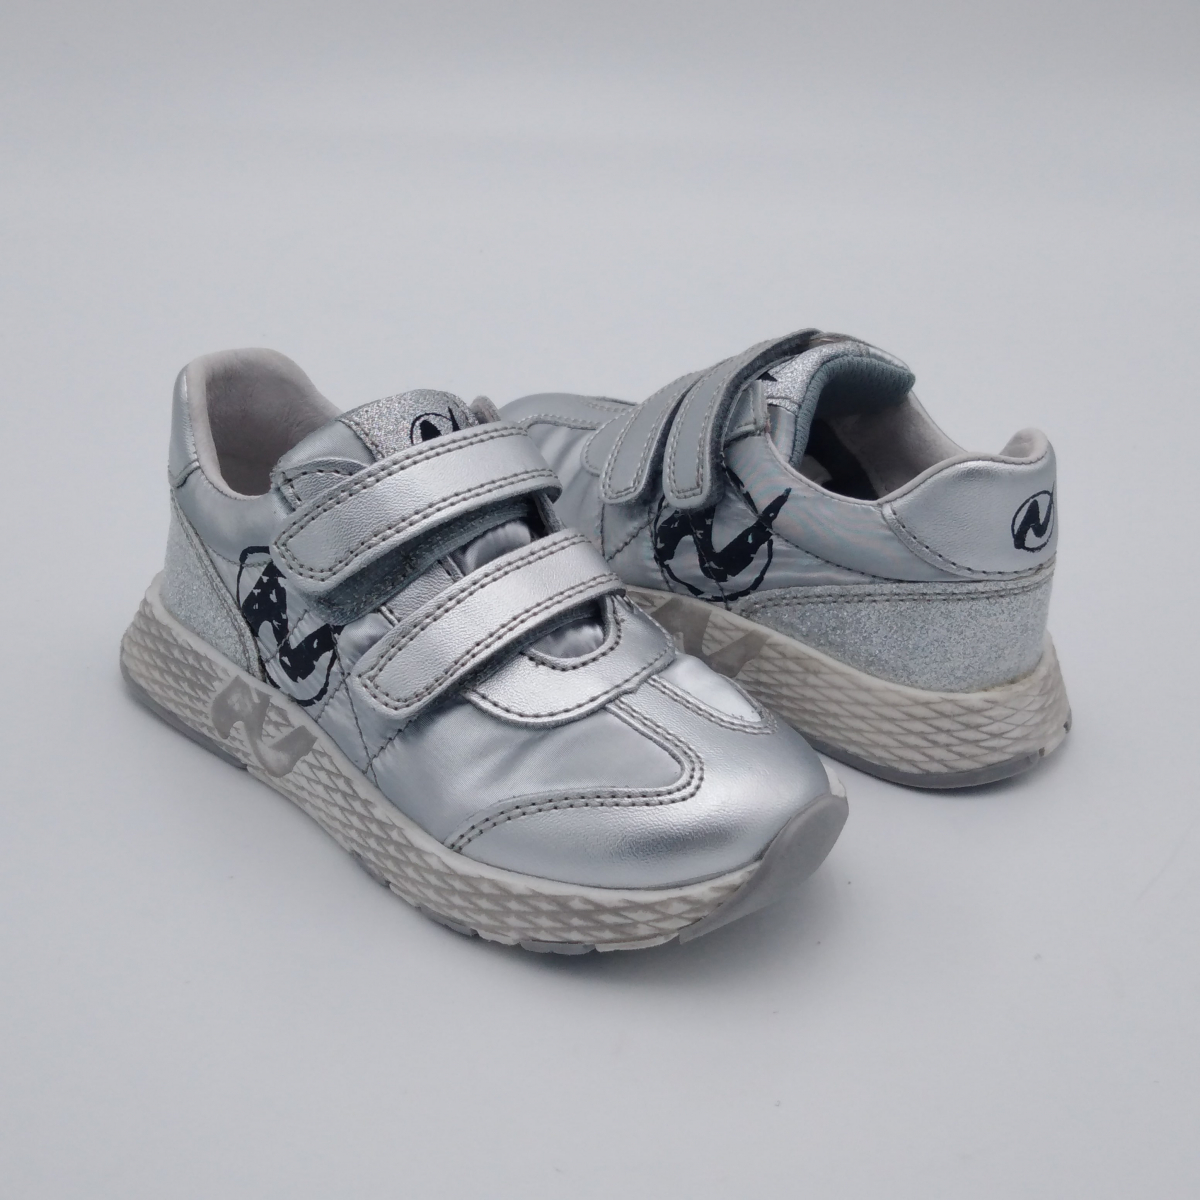 Naturino Jesko vl - Sneaker...